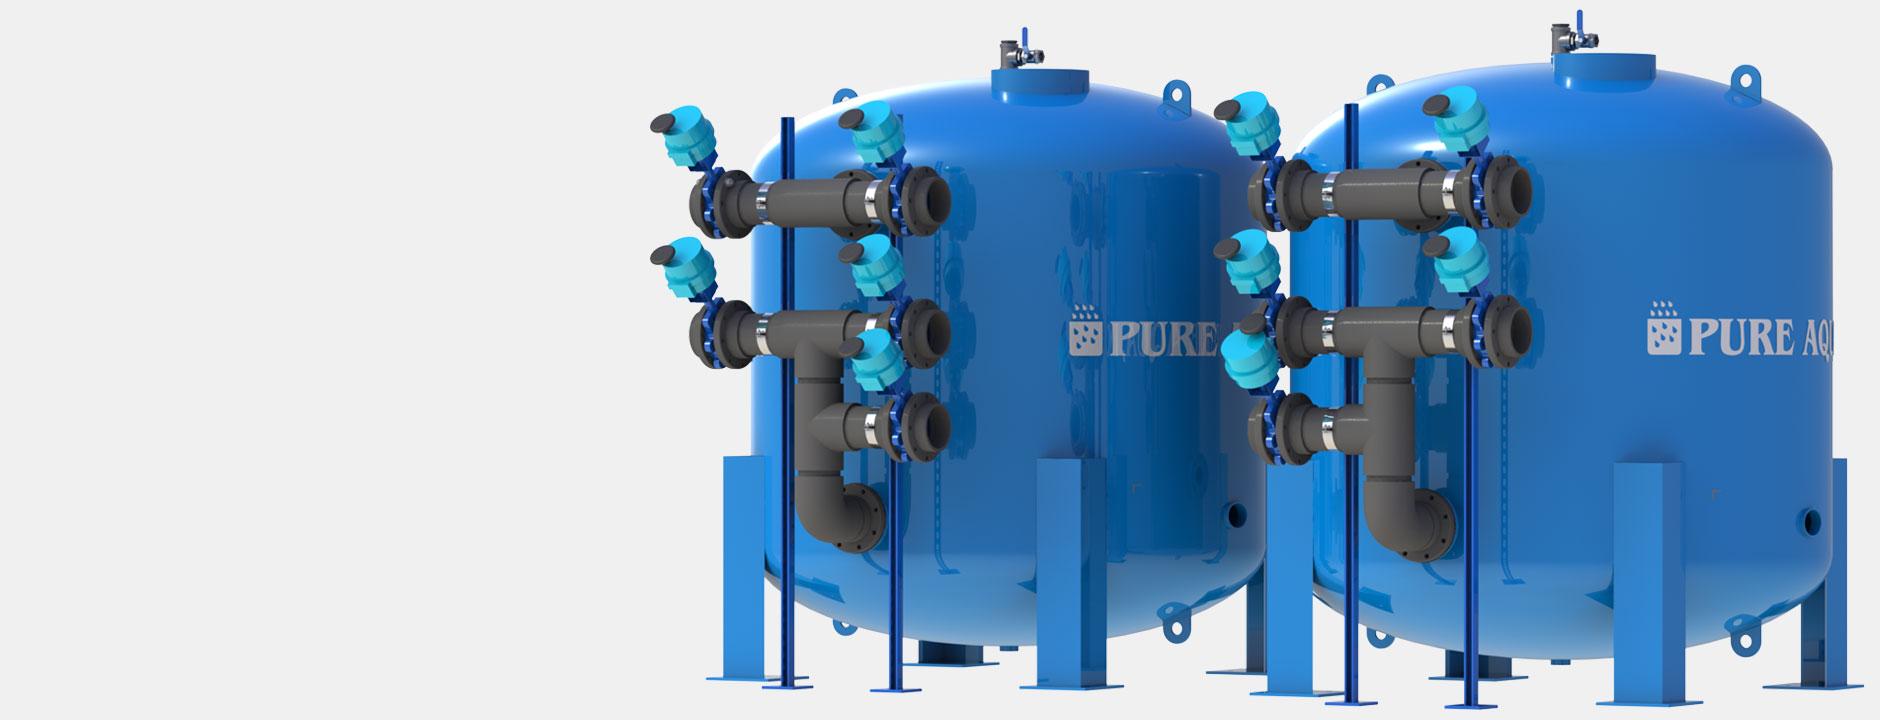 sistemas de filtros medios para agua